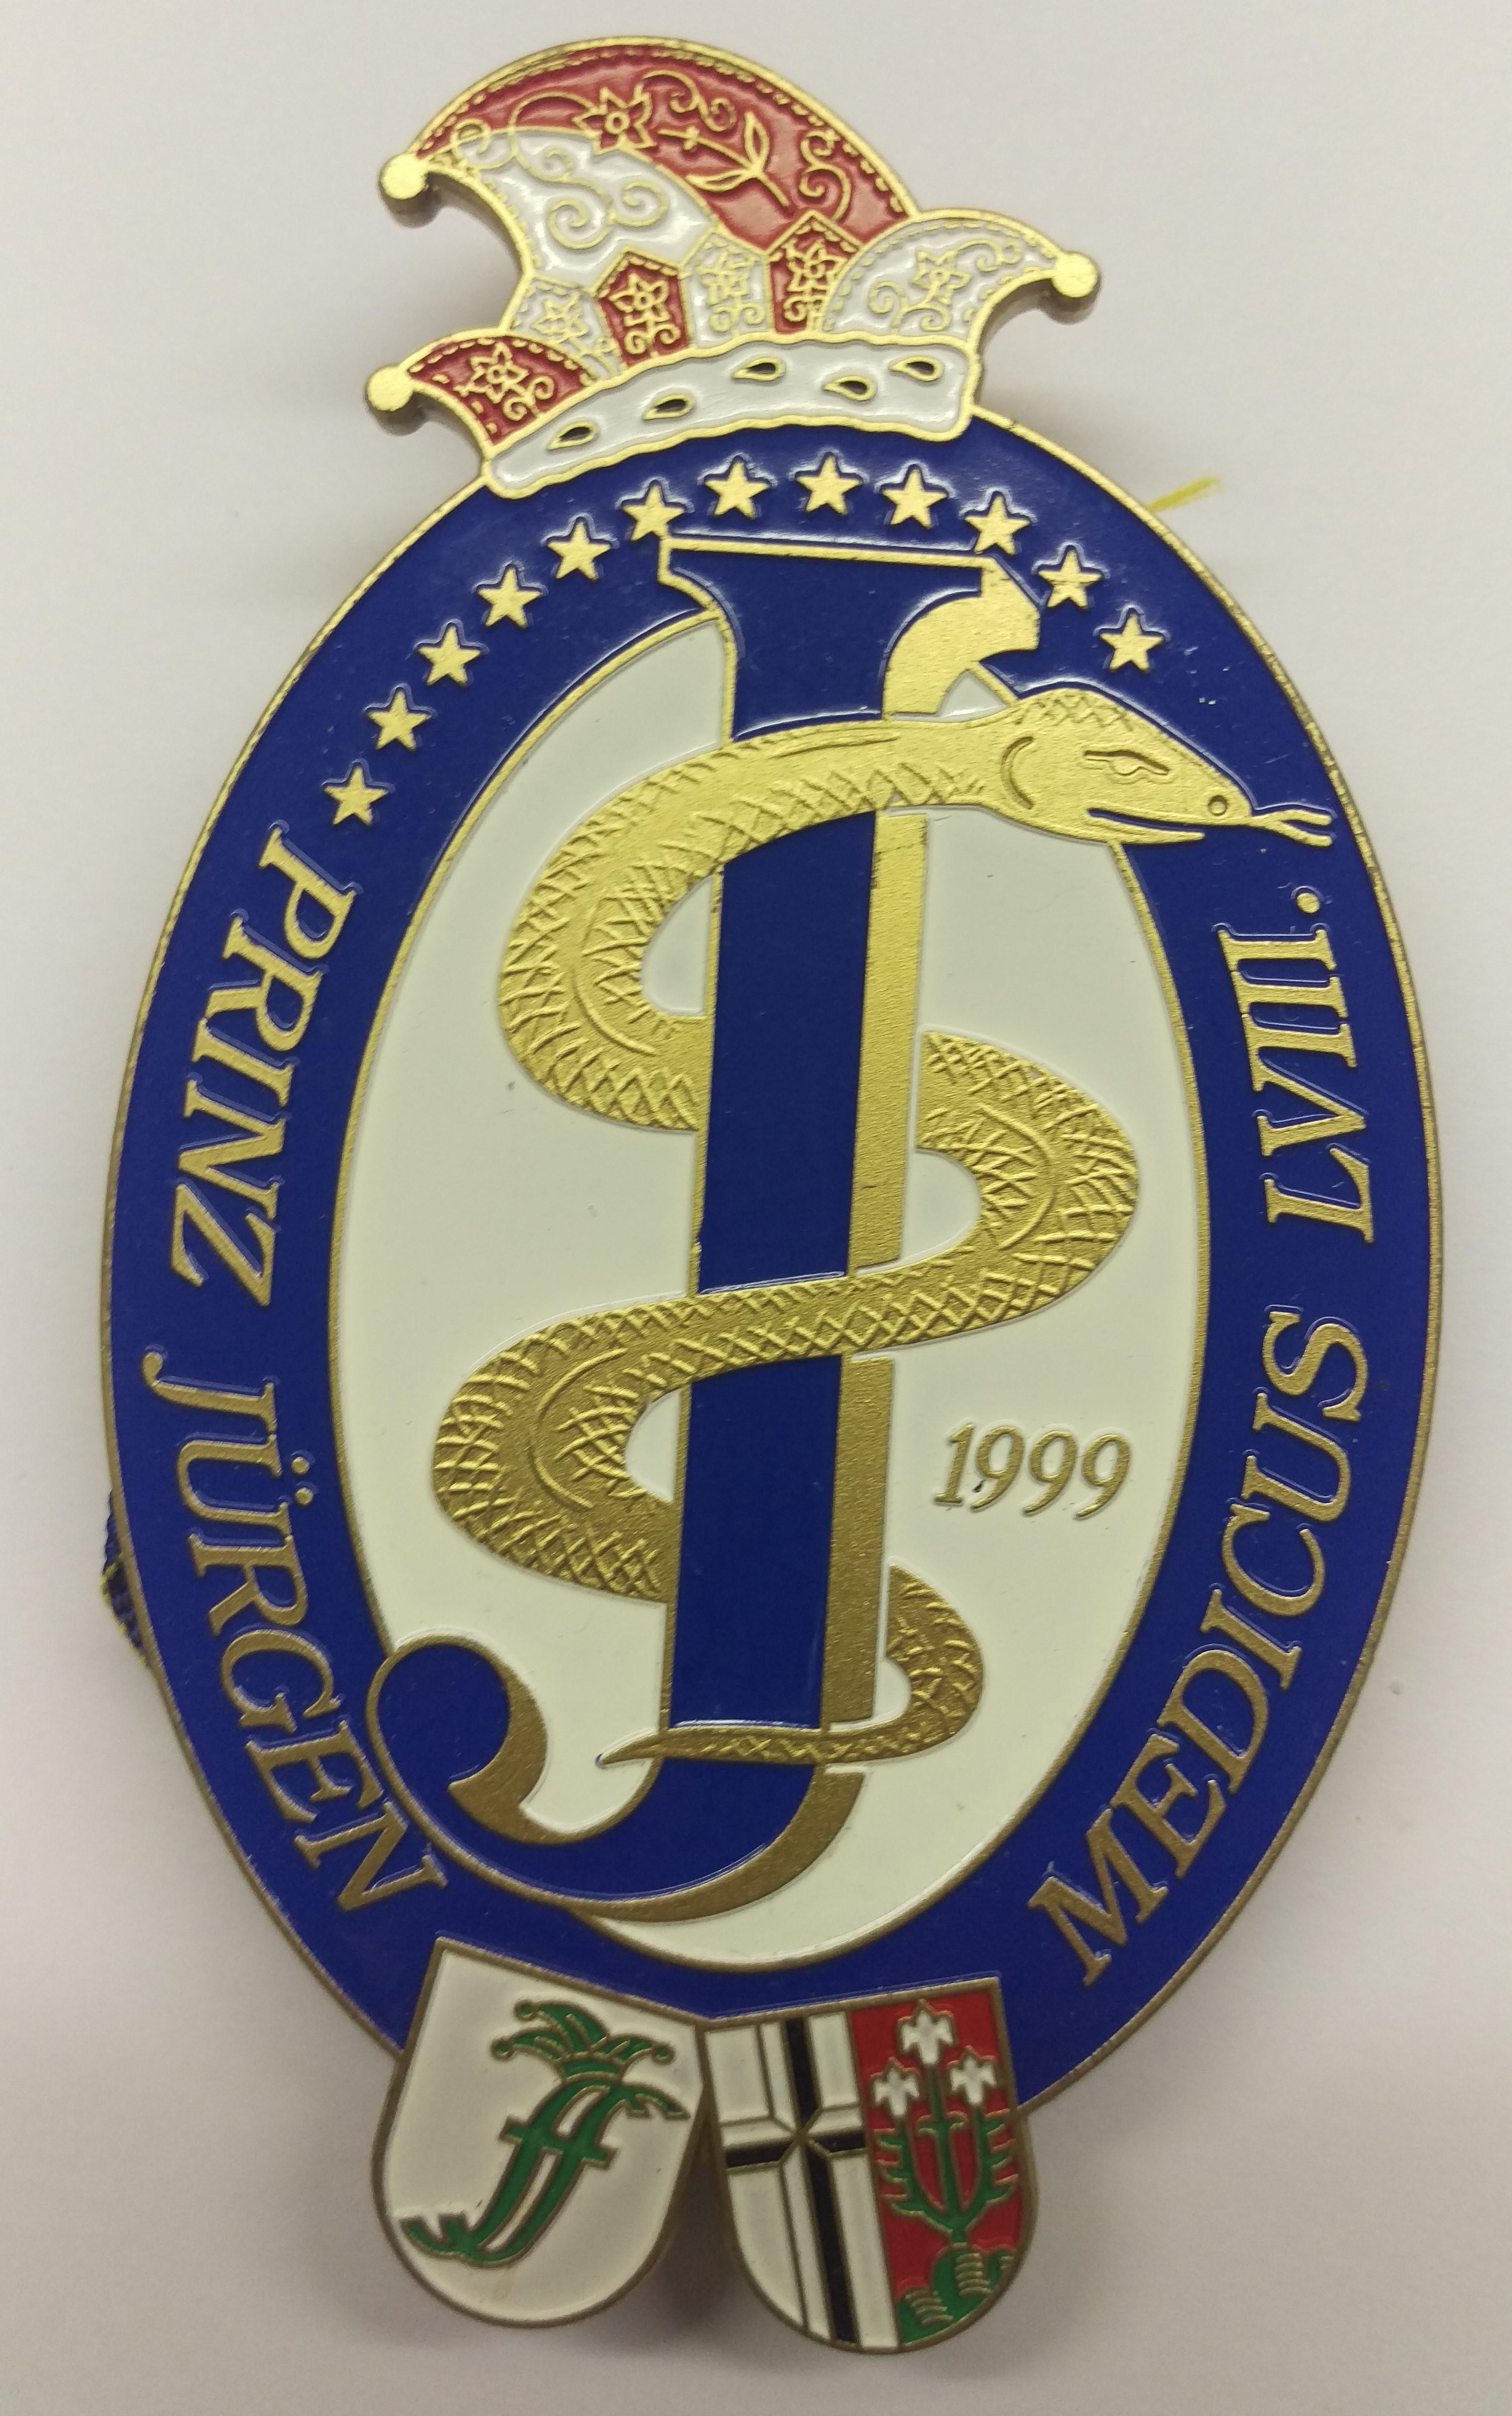 fkg-prinzenorden-1999